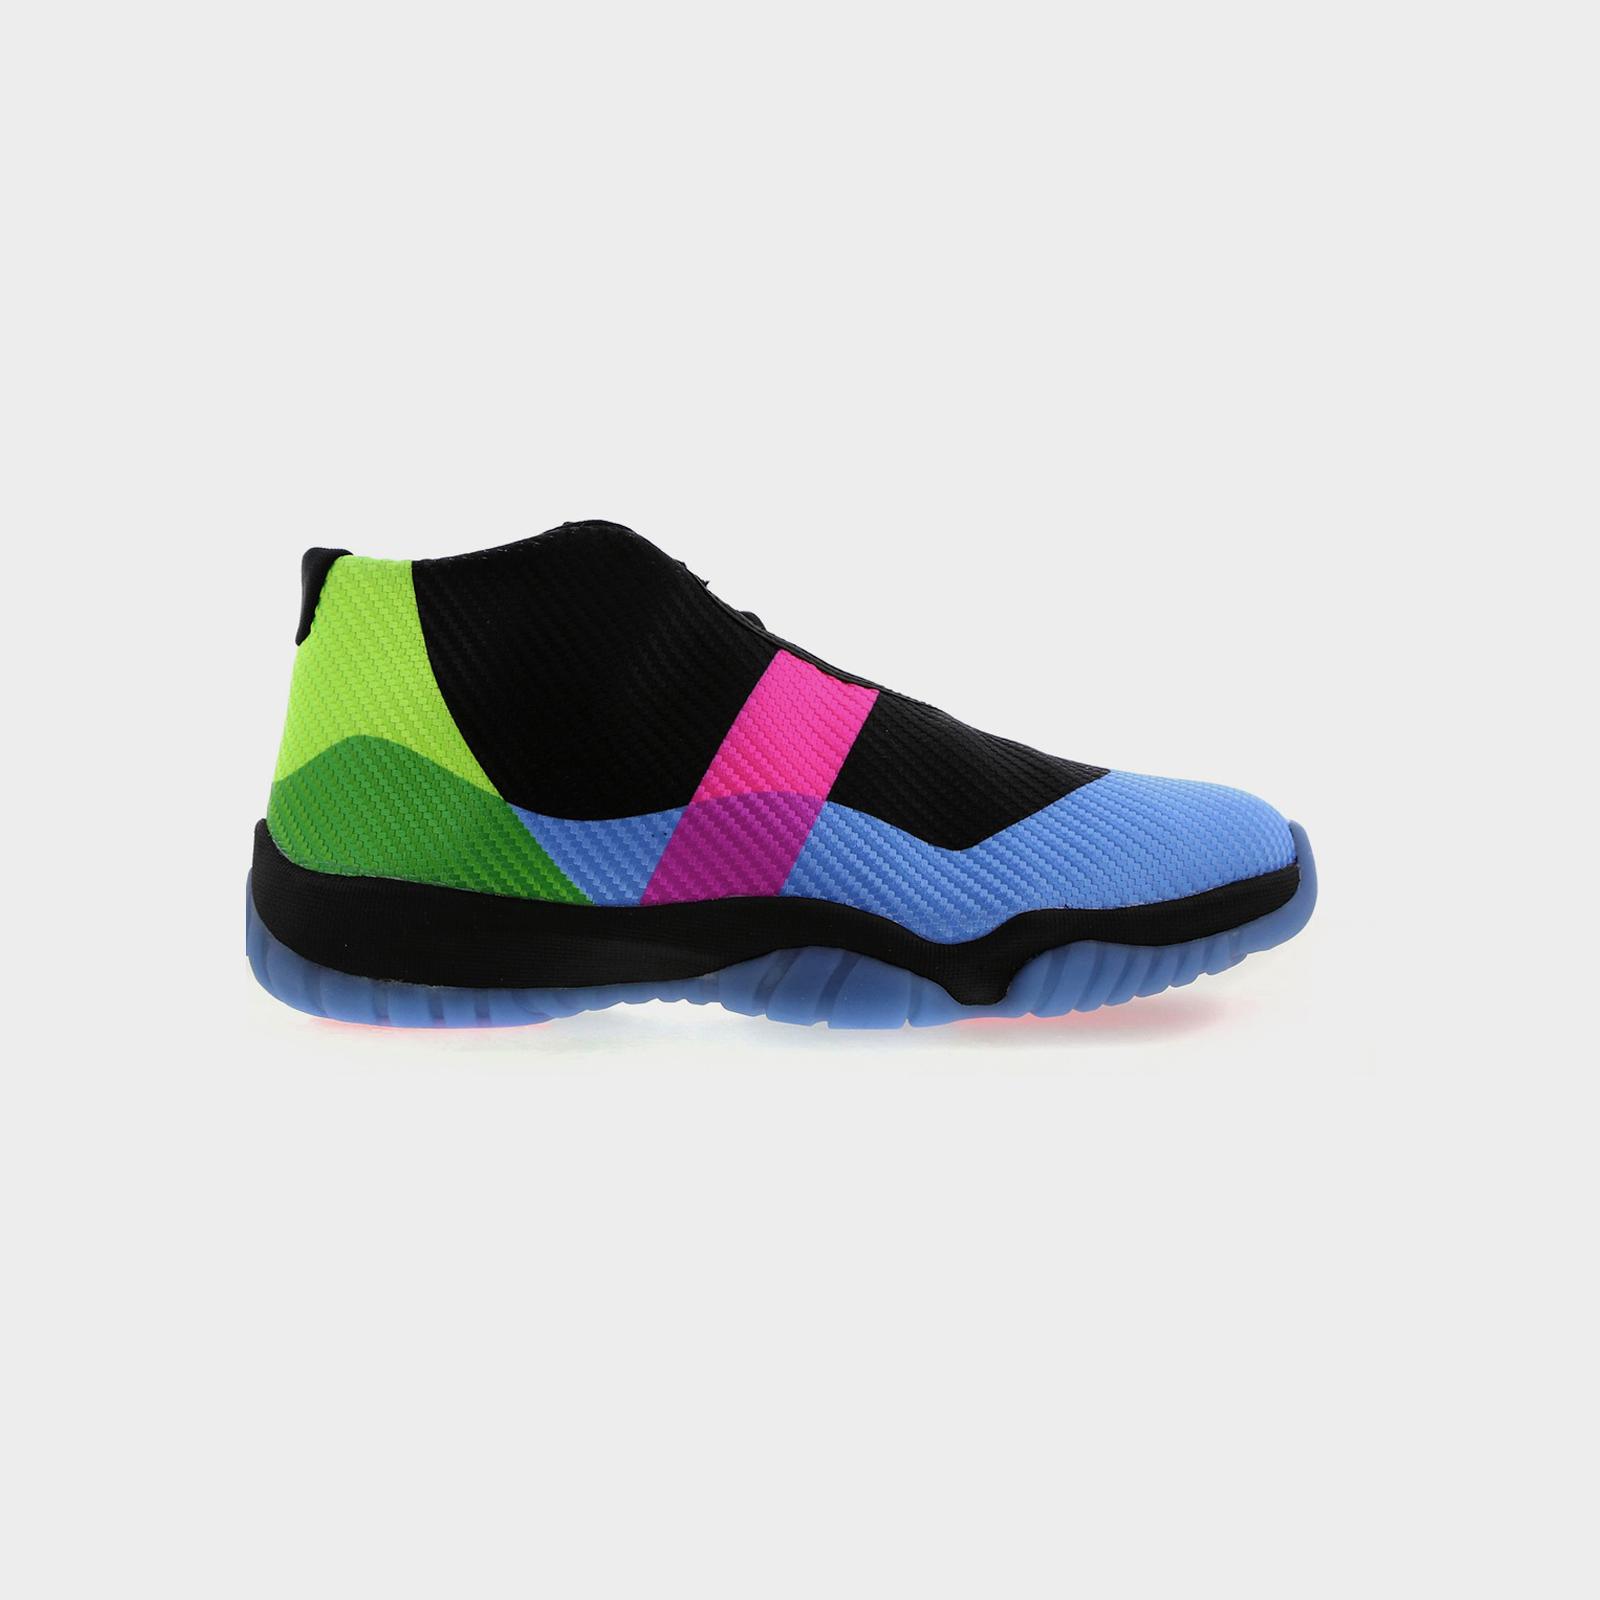 80d12946f12 Jordan Brand Air Jordan Future Q54 - At9191-001 - Sneakersnstuff ...